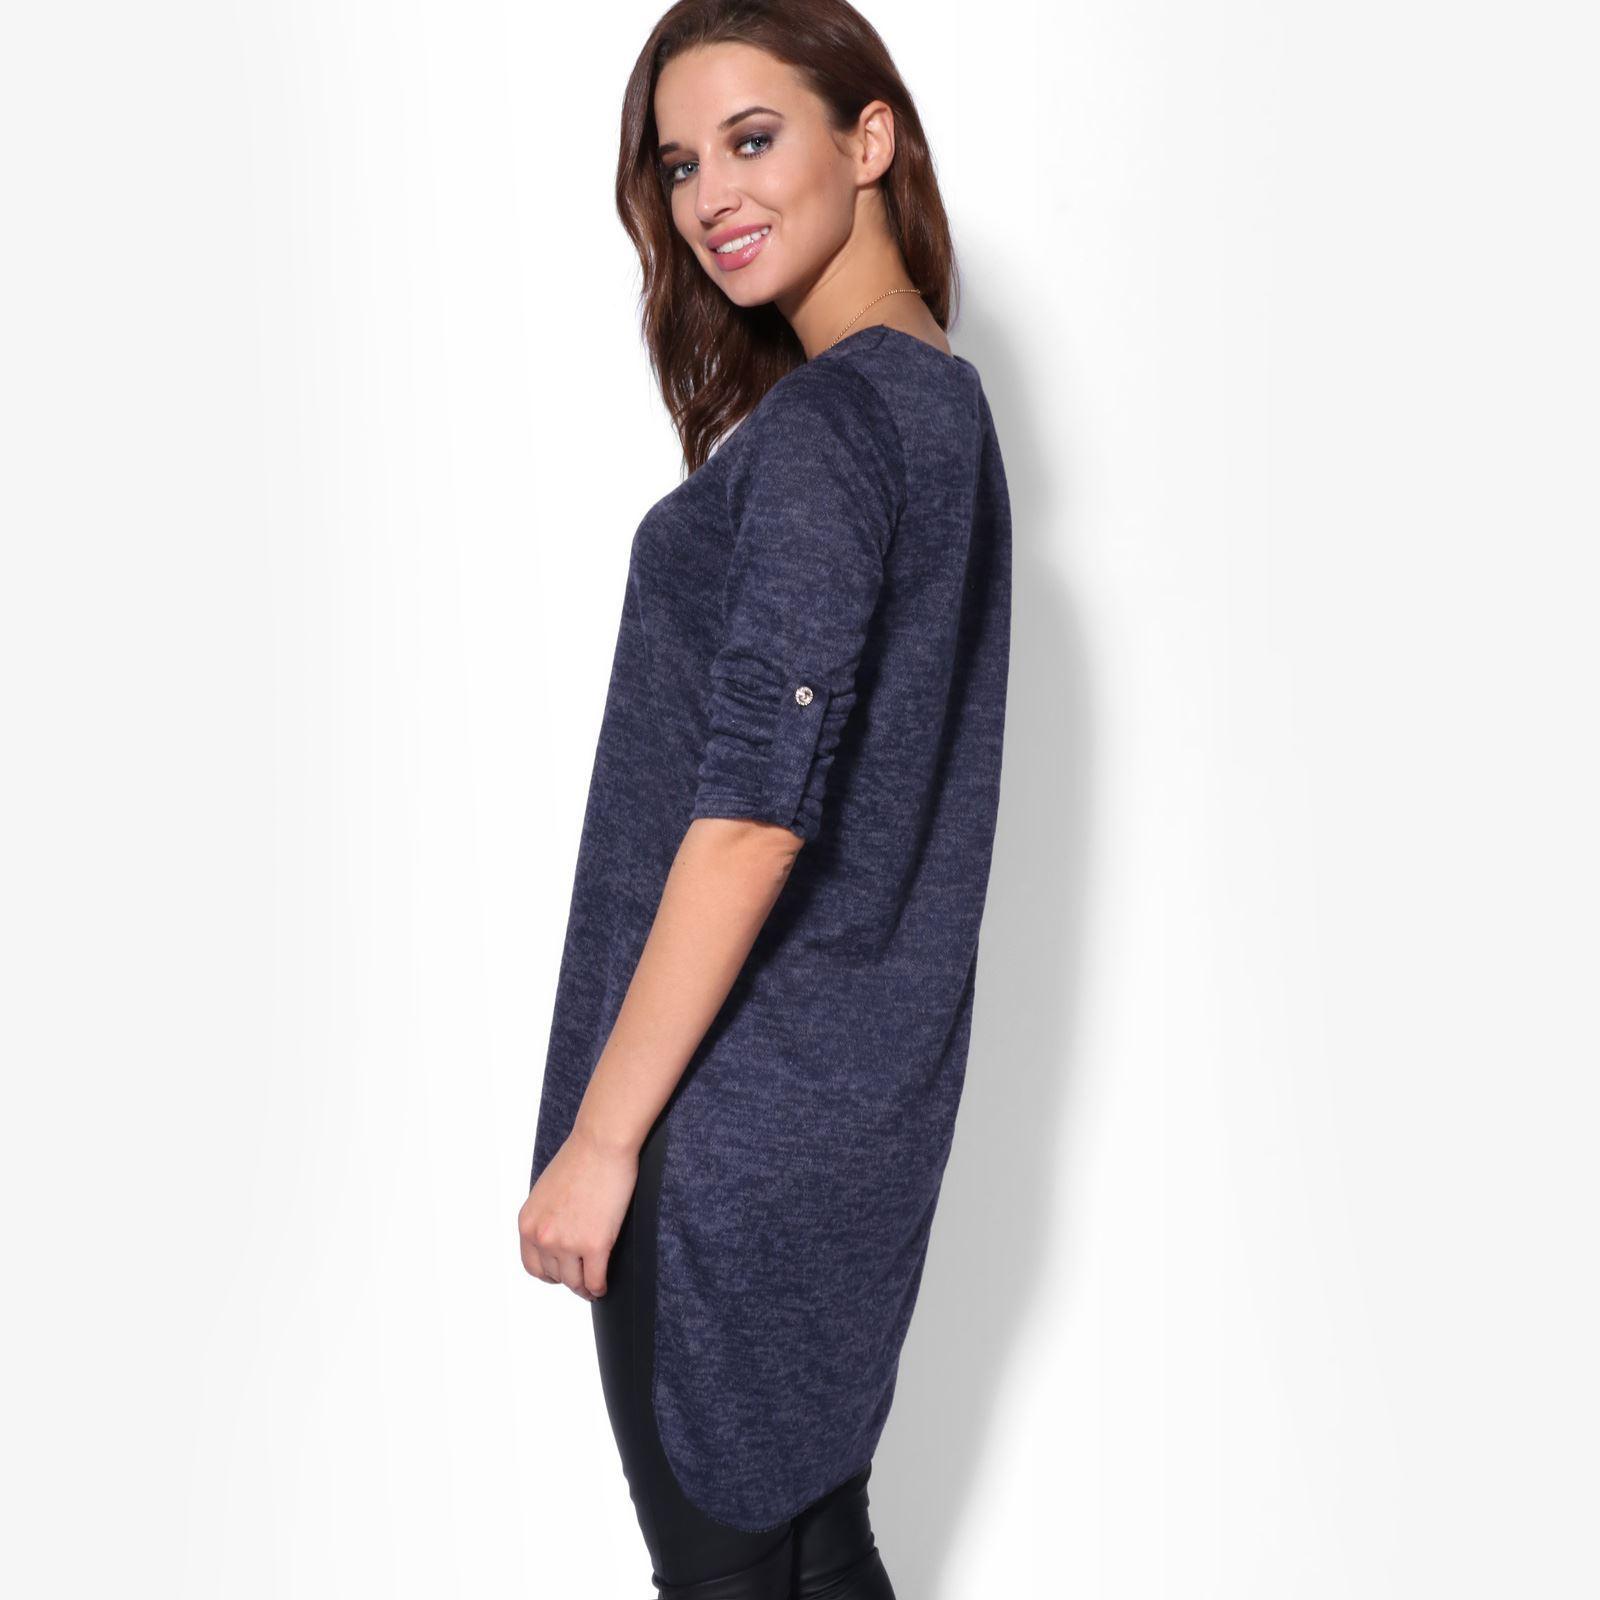 3f4549c6b130ed Womens Ladies Fluffy Knit Oversized Long Hi Low Sweater Tunic Top Jumper  Dress. Longline ...